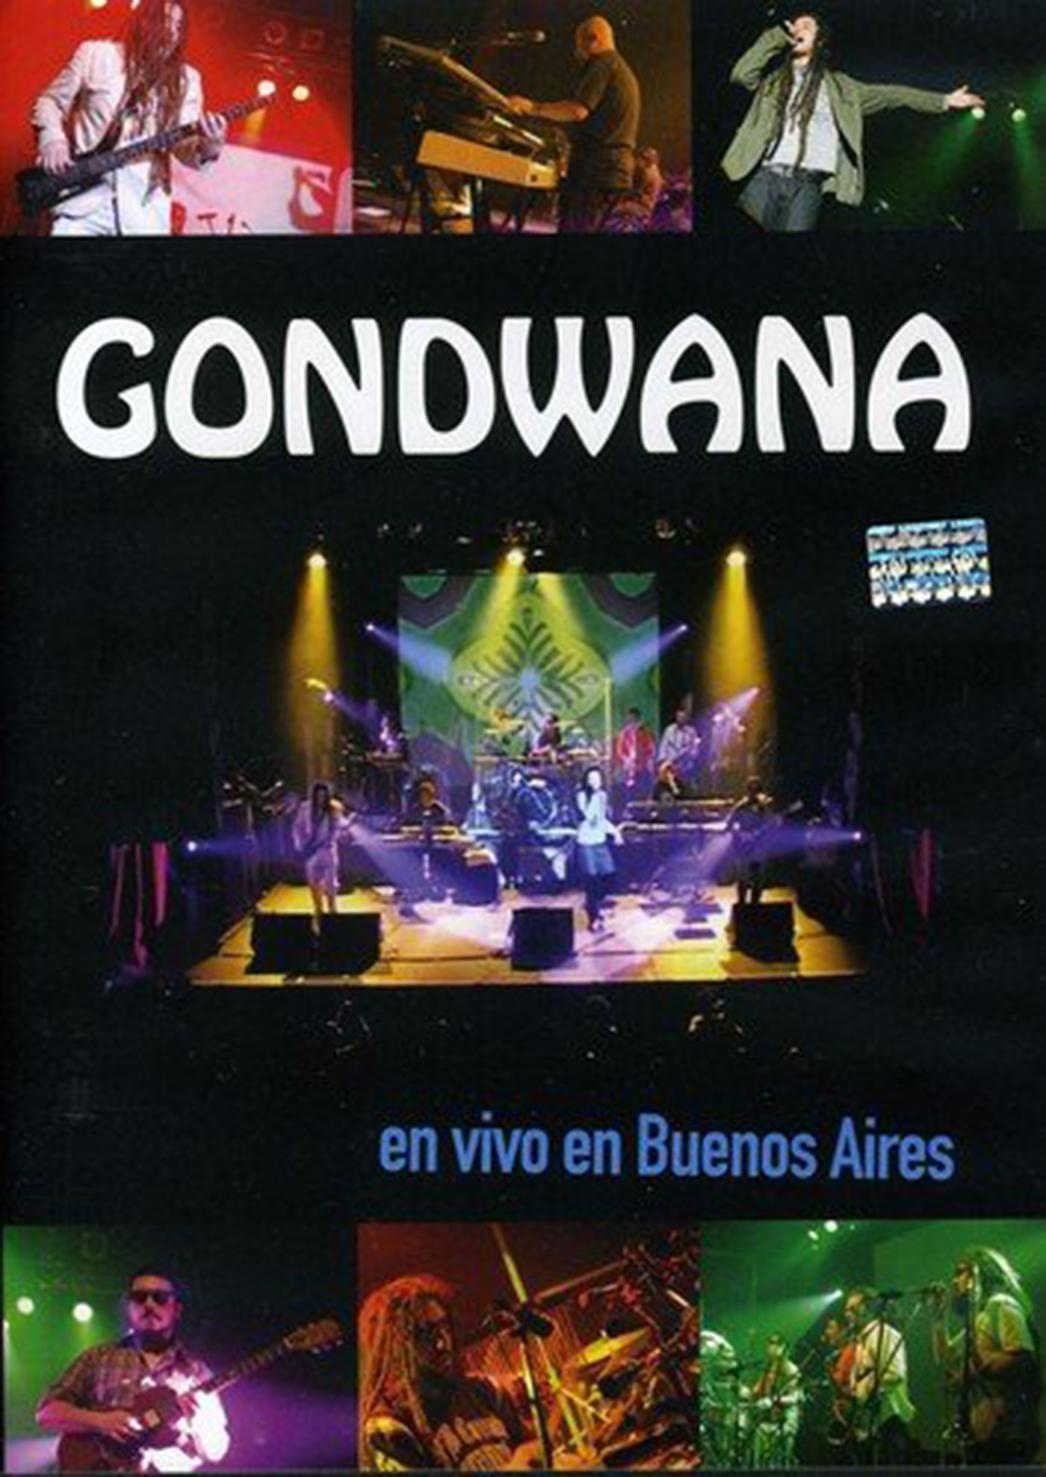 Gondwana - En Vivo En Buenos Aires DVD